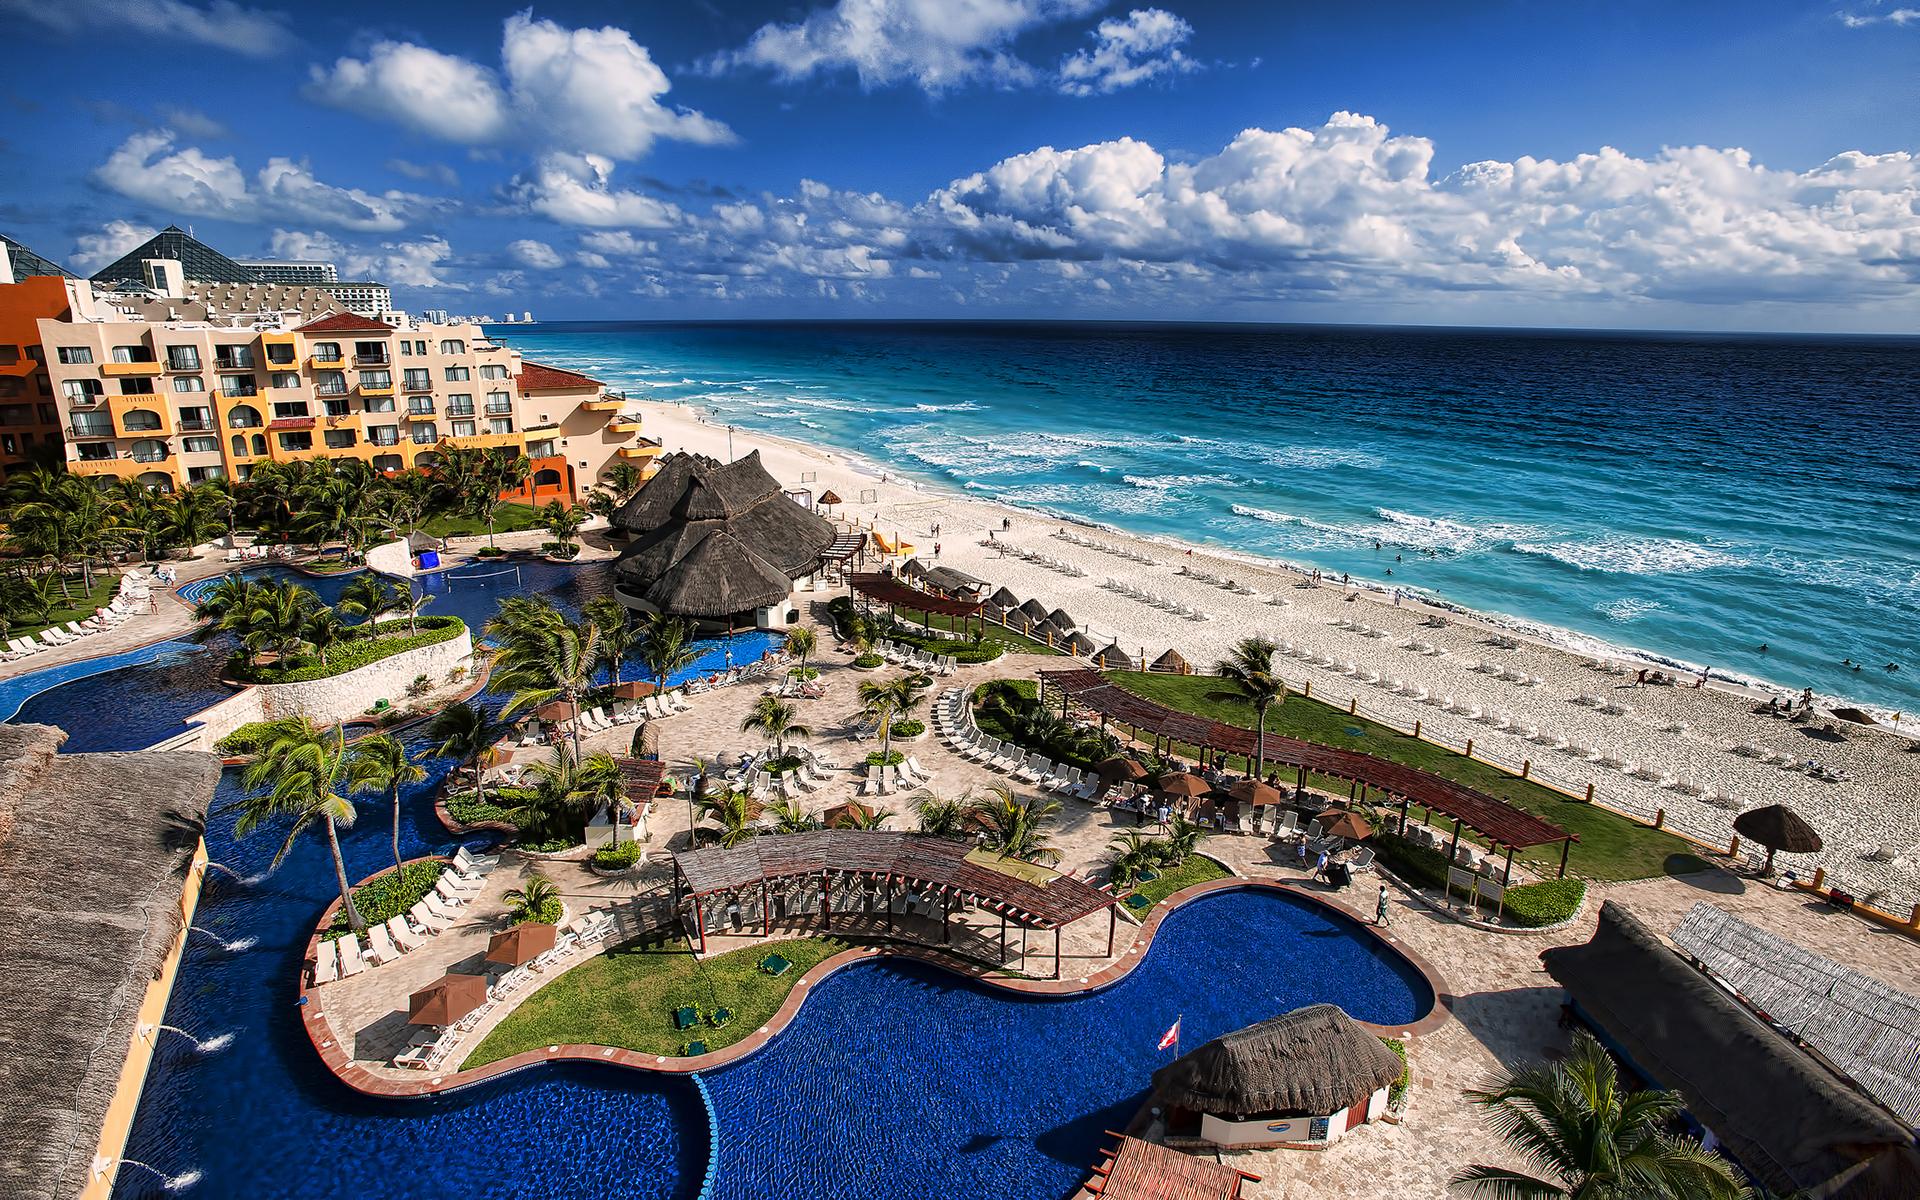 Tropical Beach Ocean Hotel ocean waves sky clouds wallpaper background 1920x1200